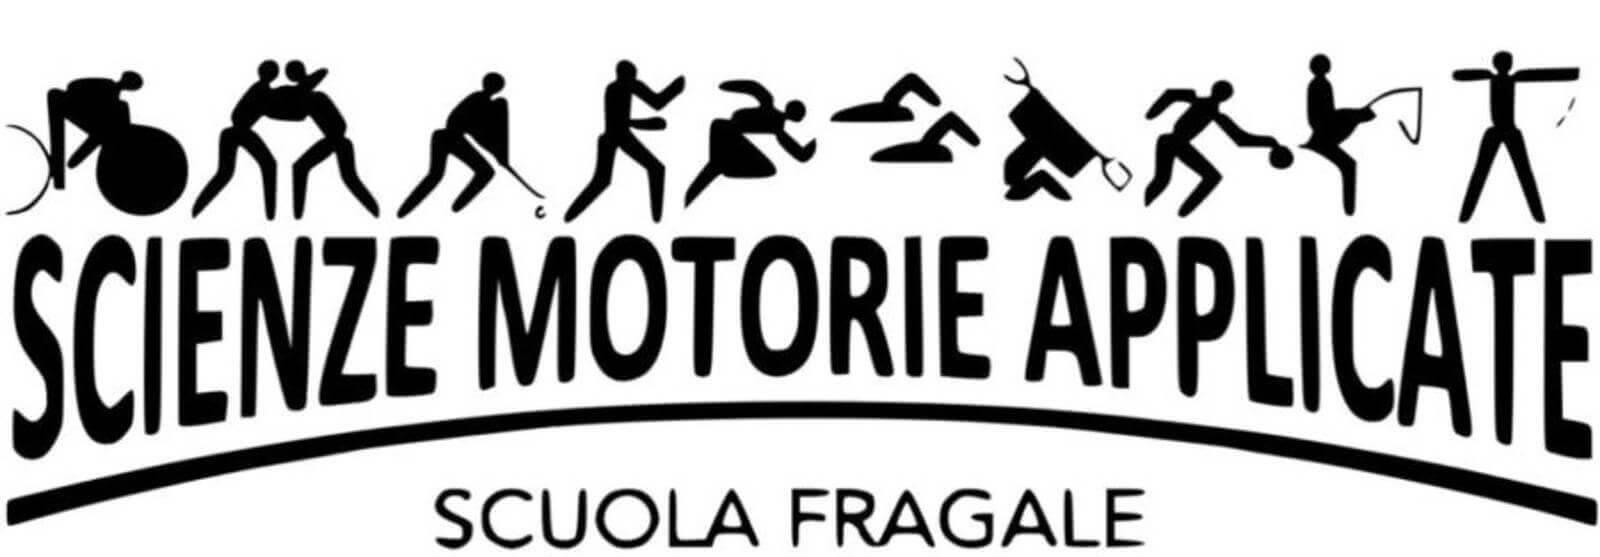 Scienze Motorie Applicate Scuola Fragale Pisa